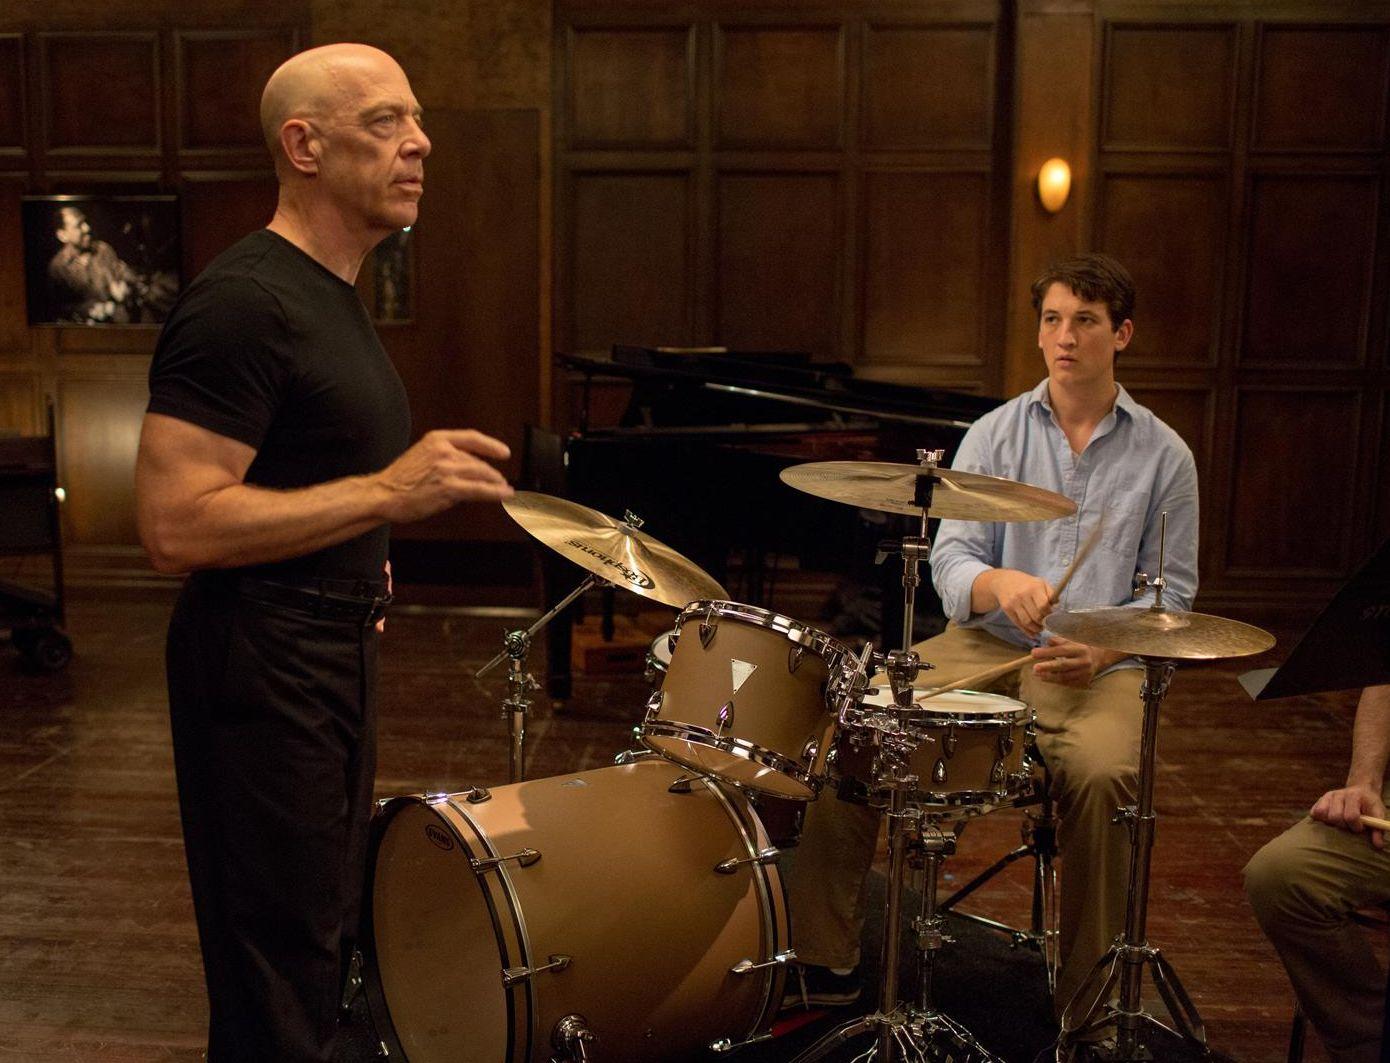 Andrew and Fletcher practice in Whiplash